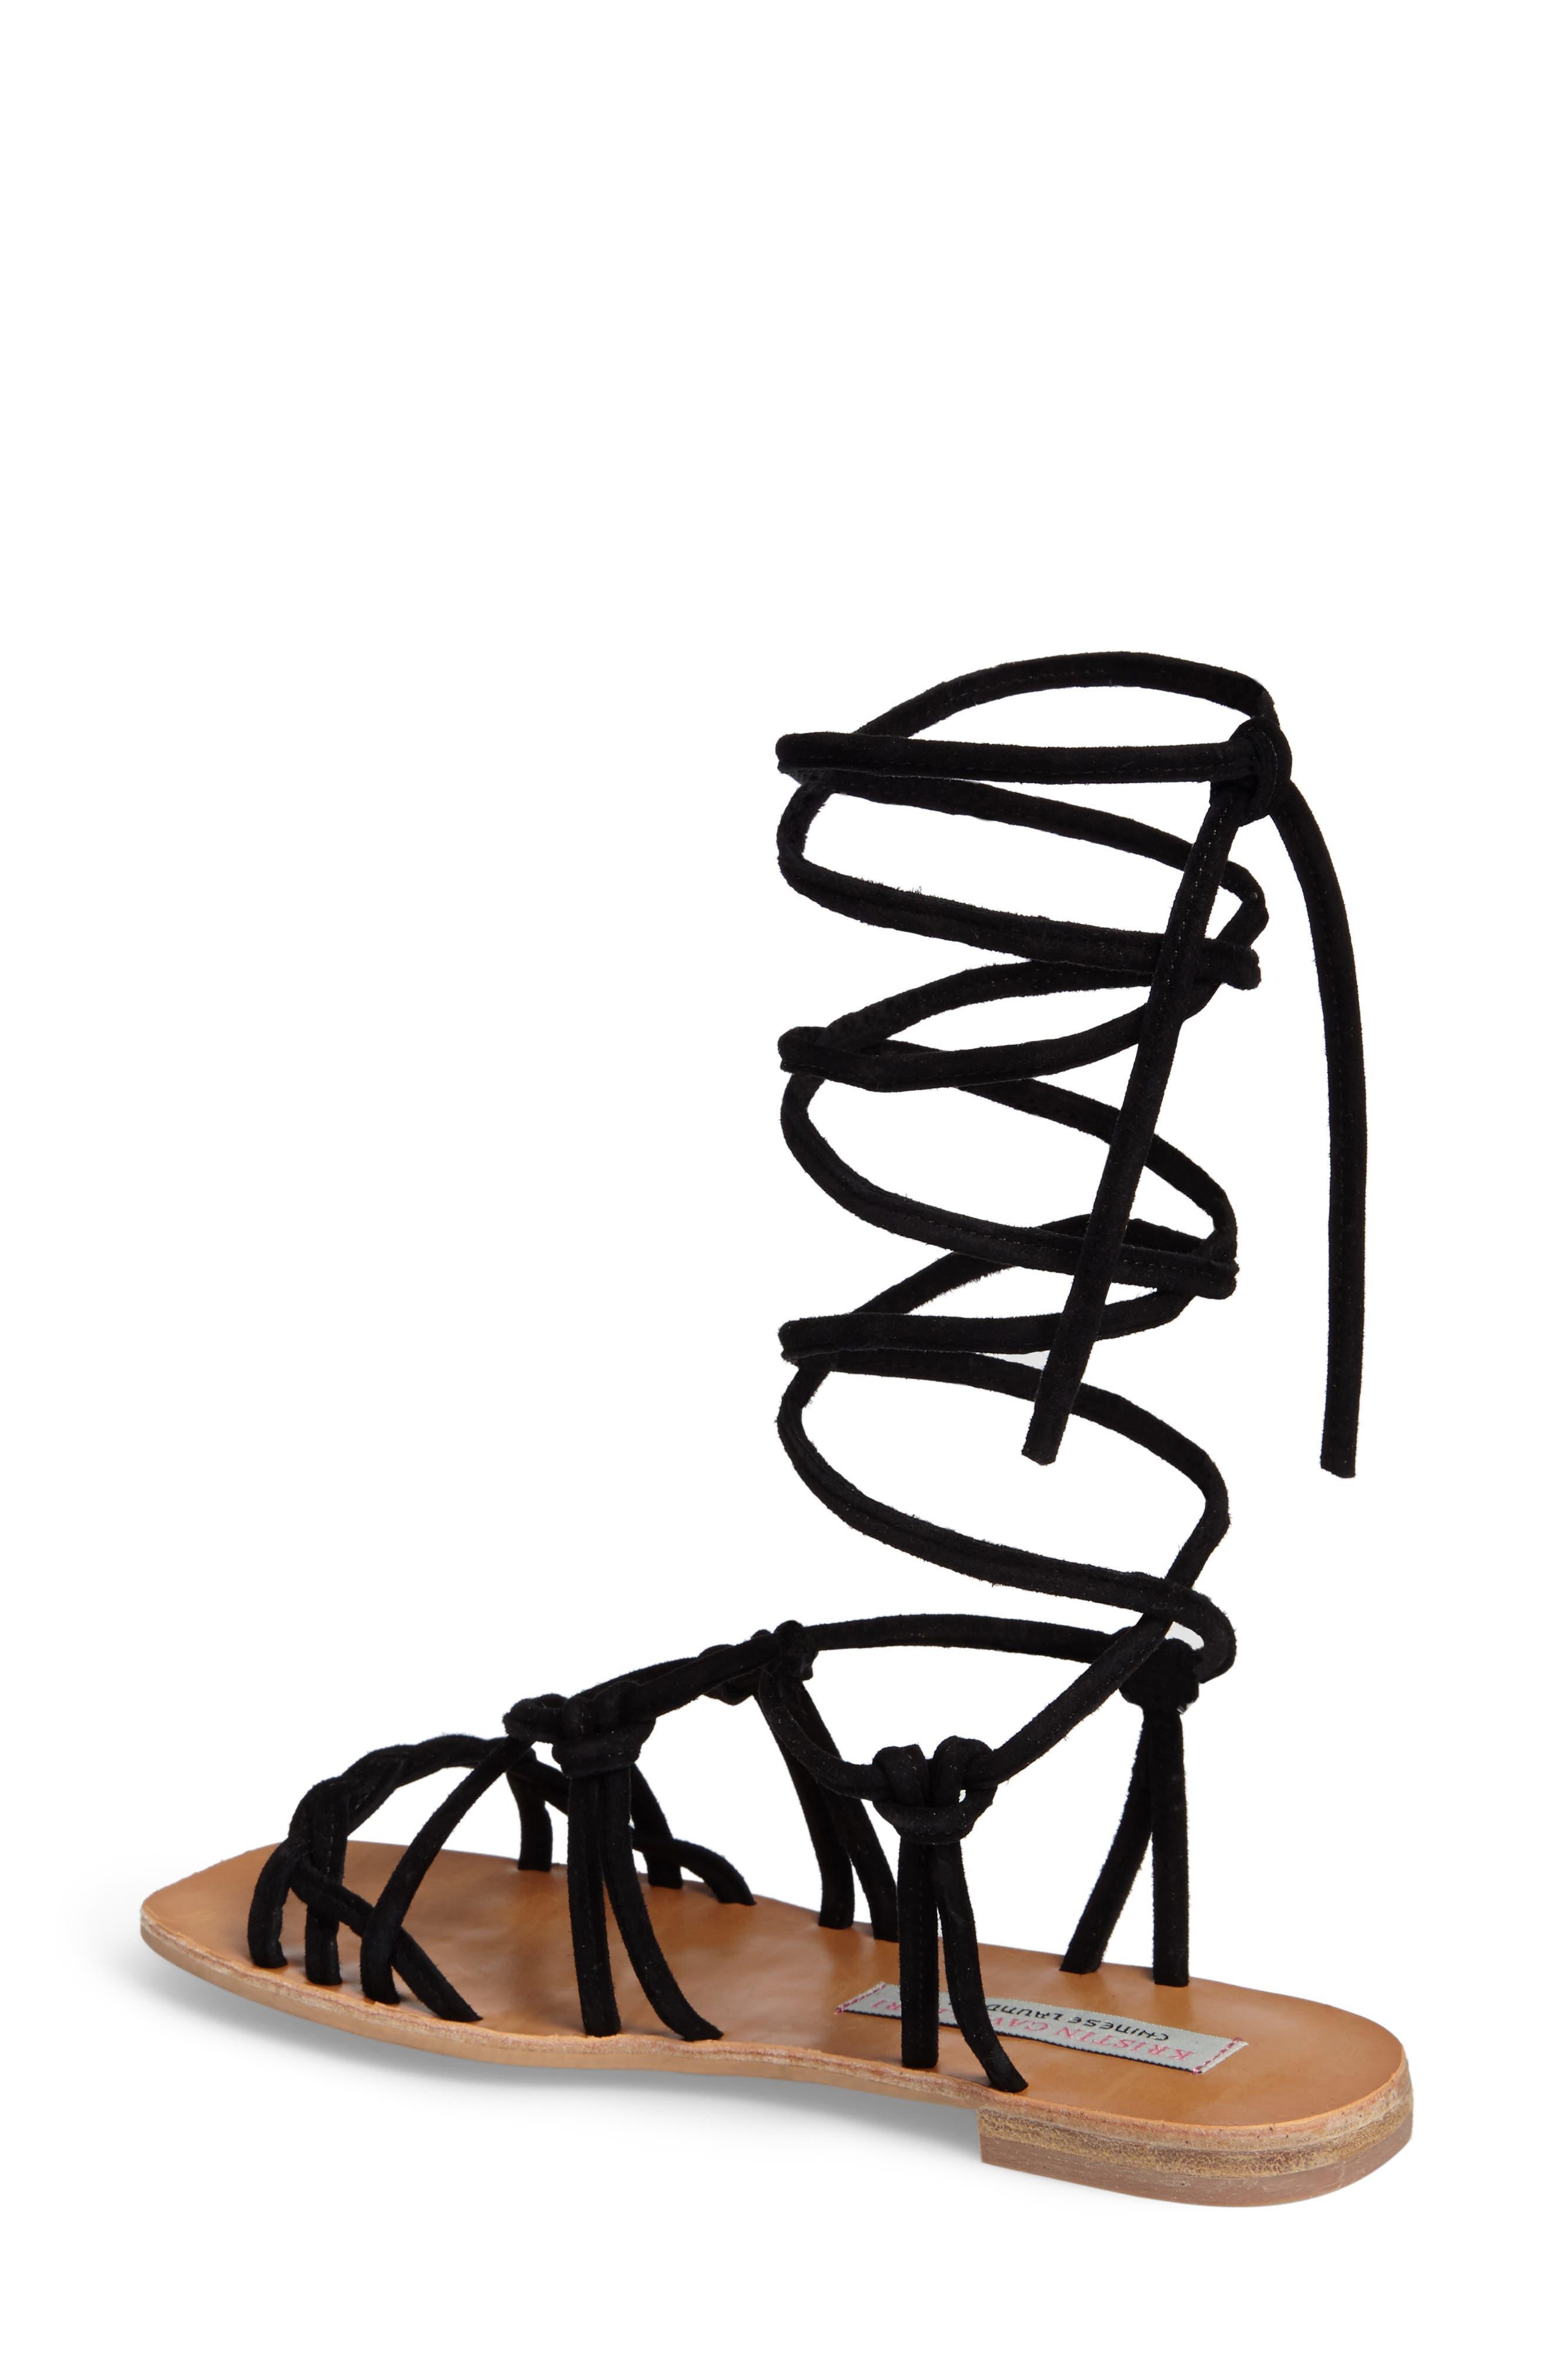 KRISTIN CAVALLARI,                             Tori Knotted Wraparound Sandal,                             Alternate thumbnail 2, color,                             001